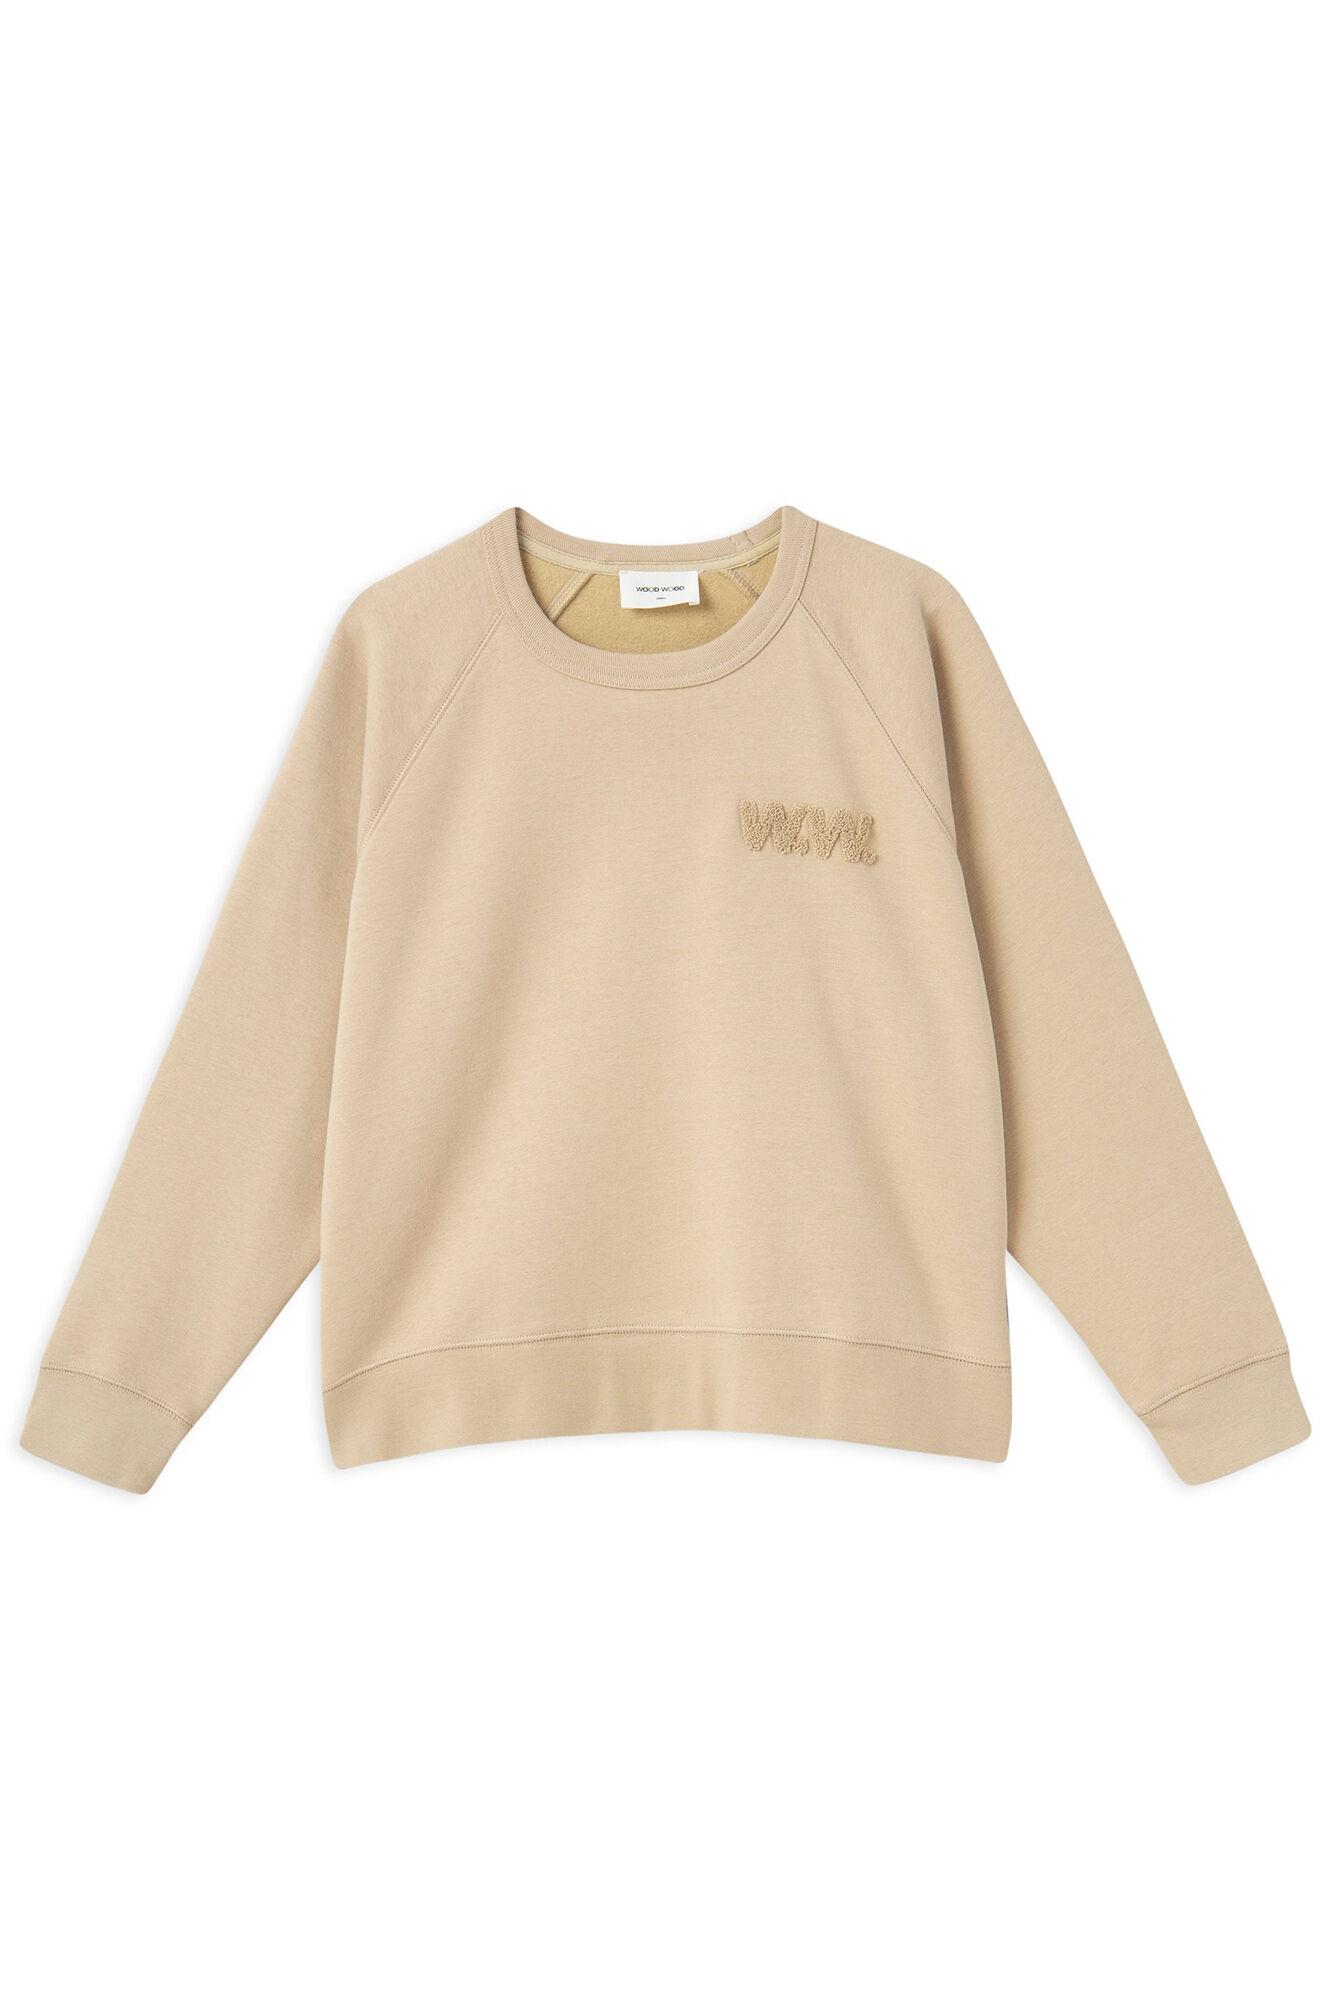 Jerri sweatshirt 11912400-2453, LIGHT KHAKI